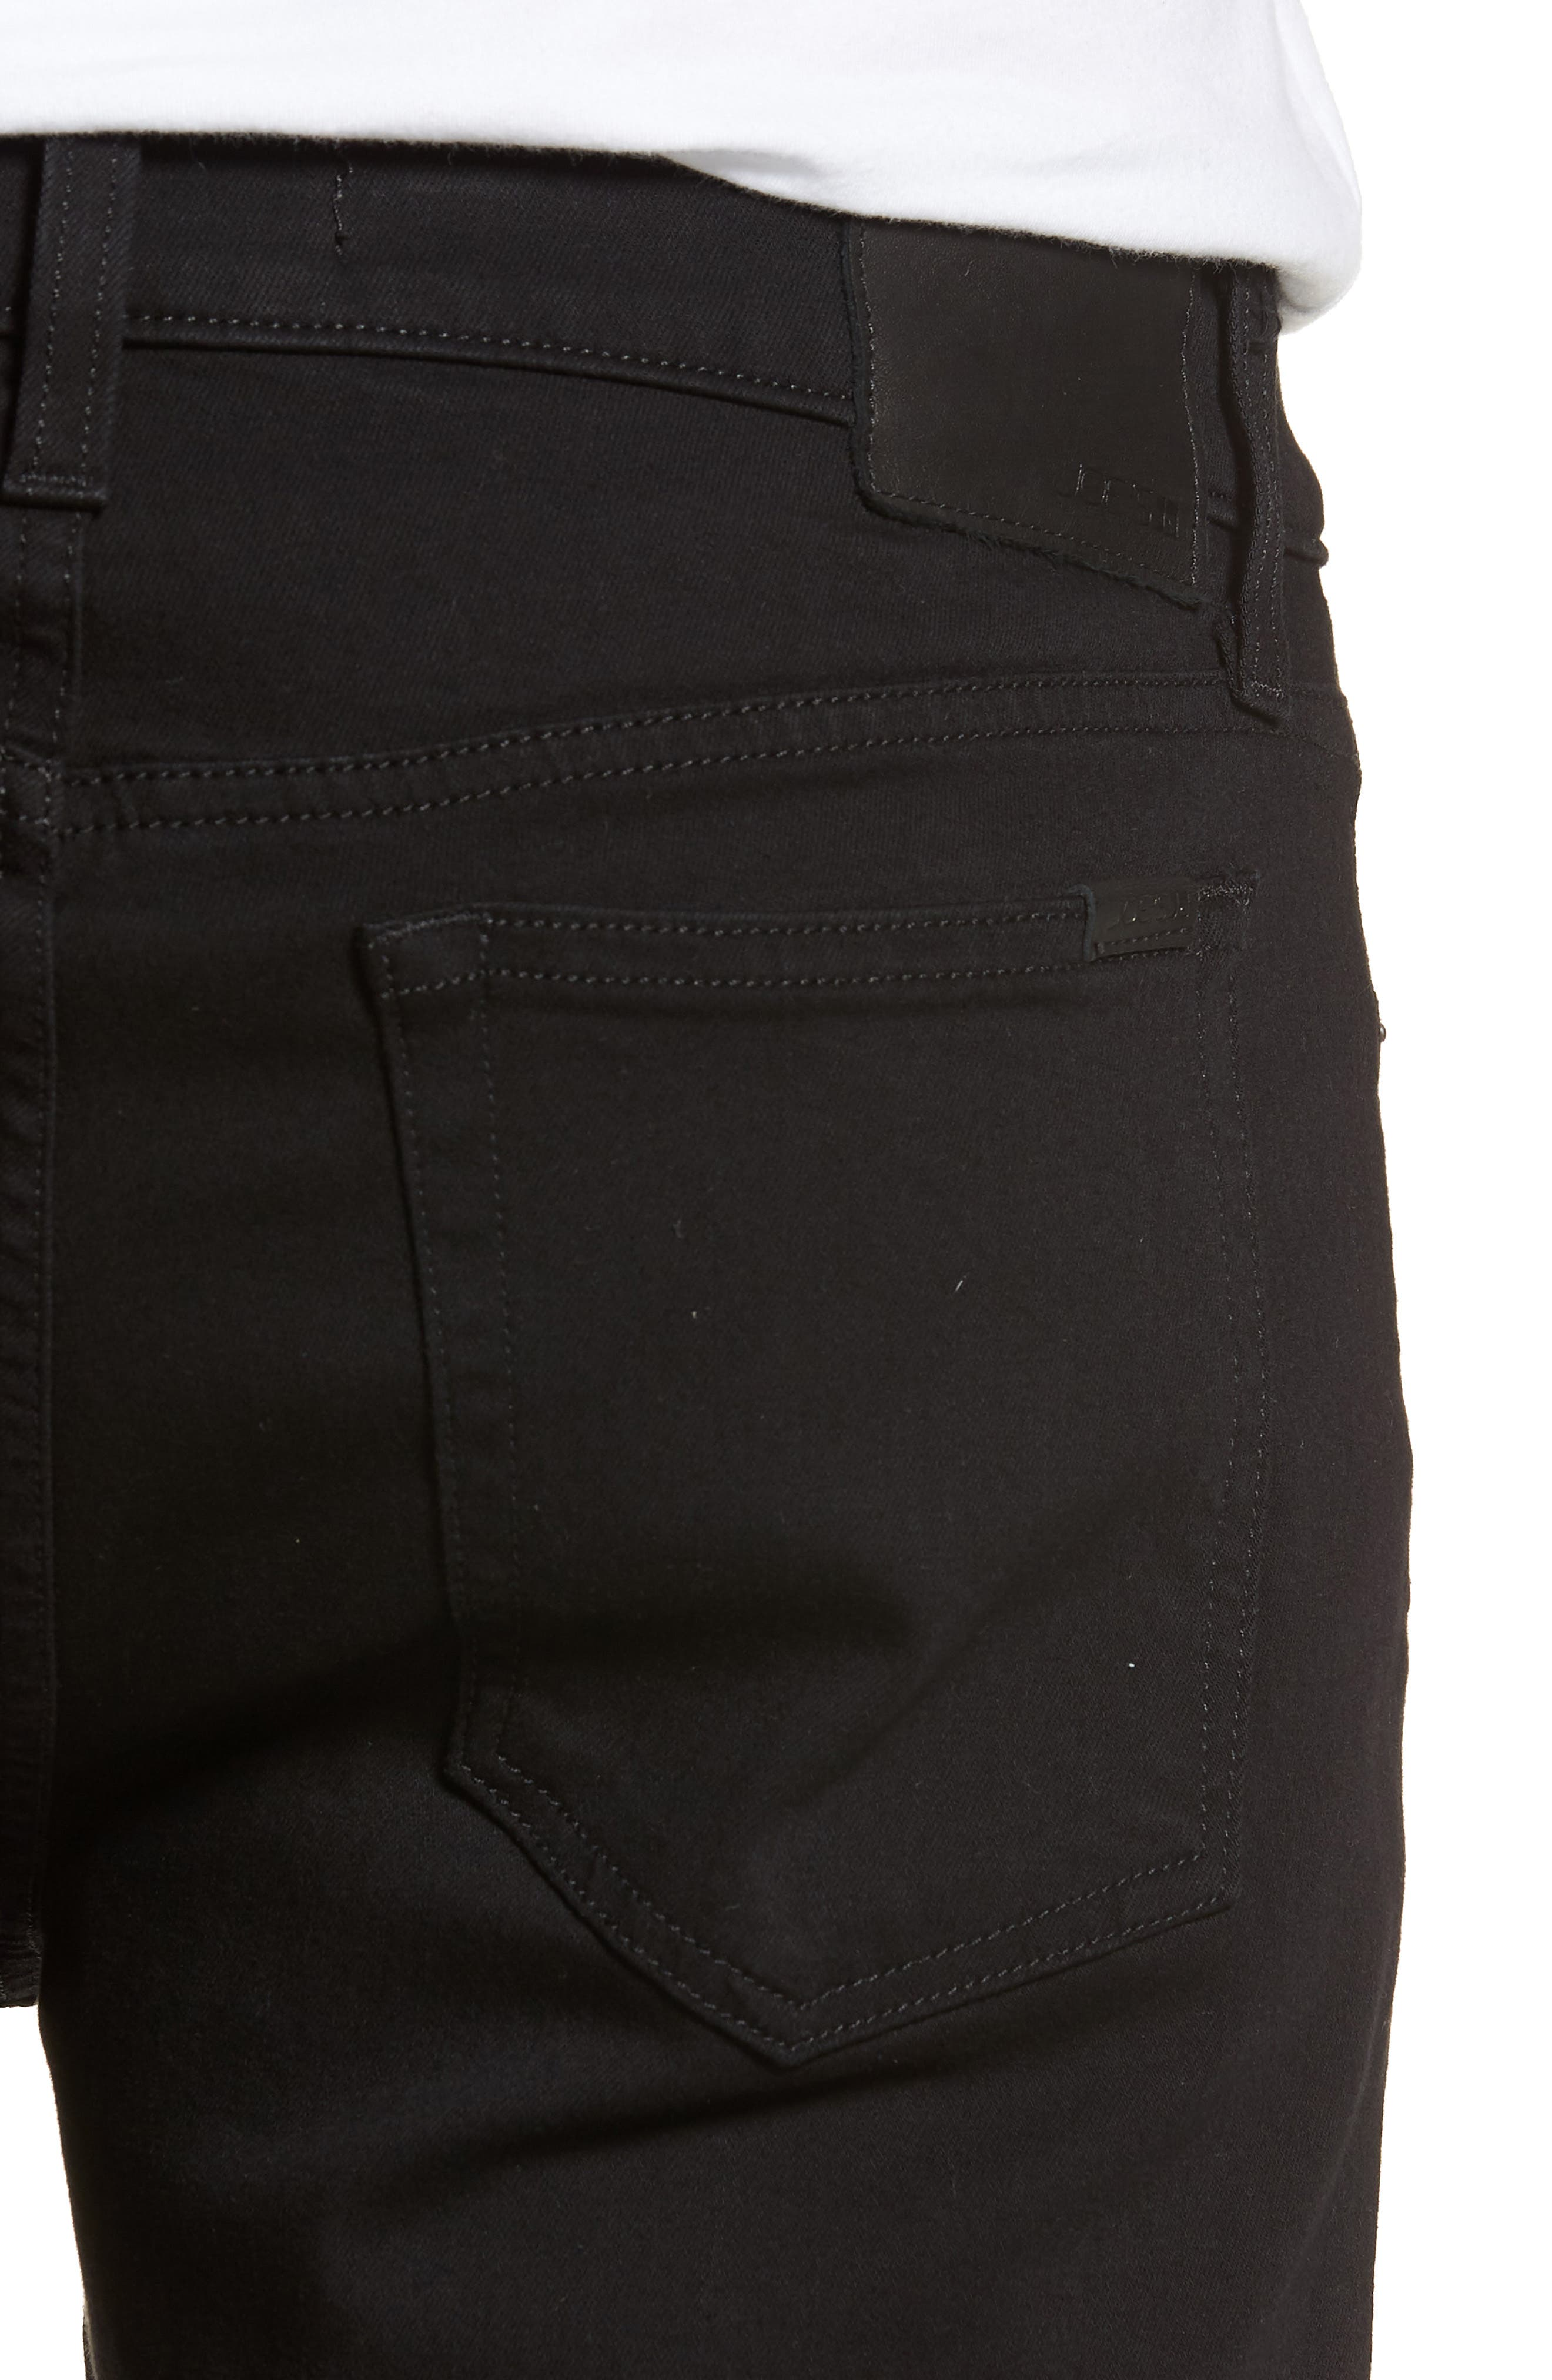 Brixton Slim Straight Fit Jeans,                             Alternate thumbnail 4, color,                             ABRAHAM